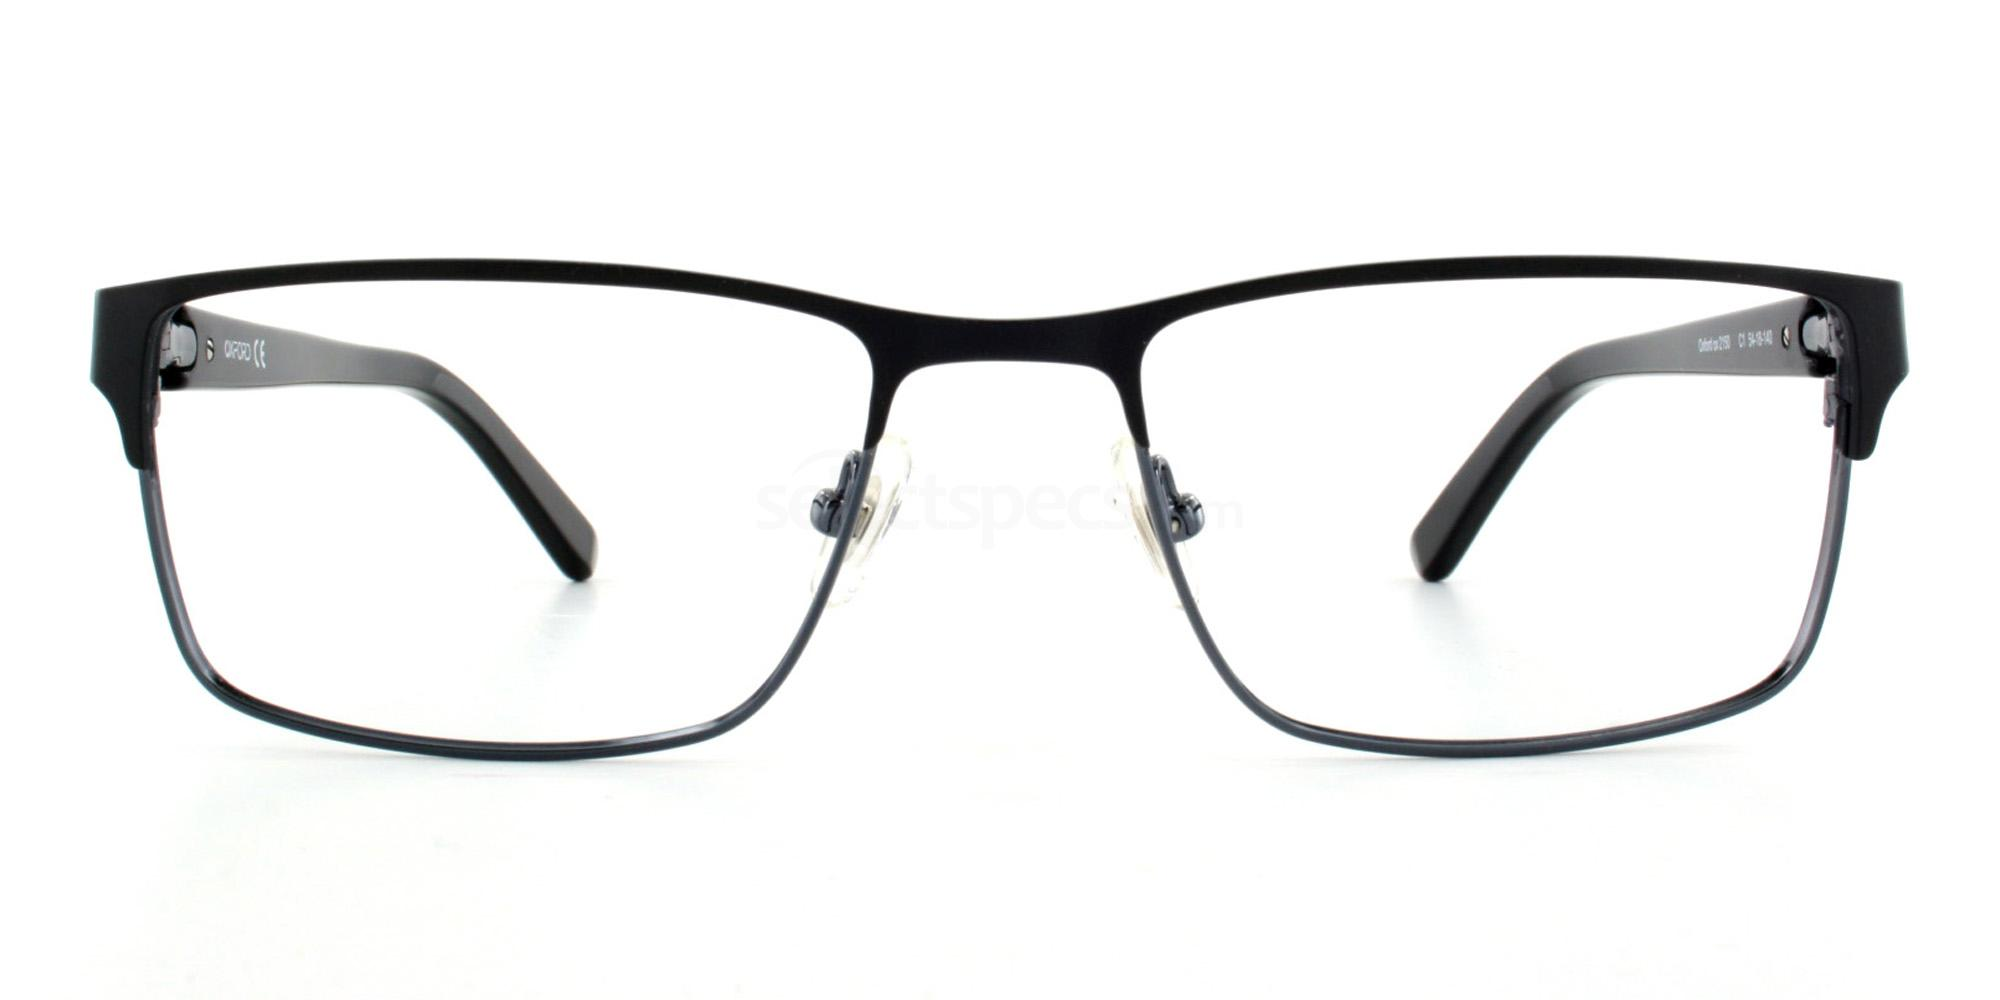 C1 OXF 2150 Glasses, Oxford